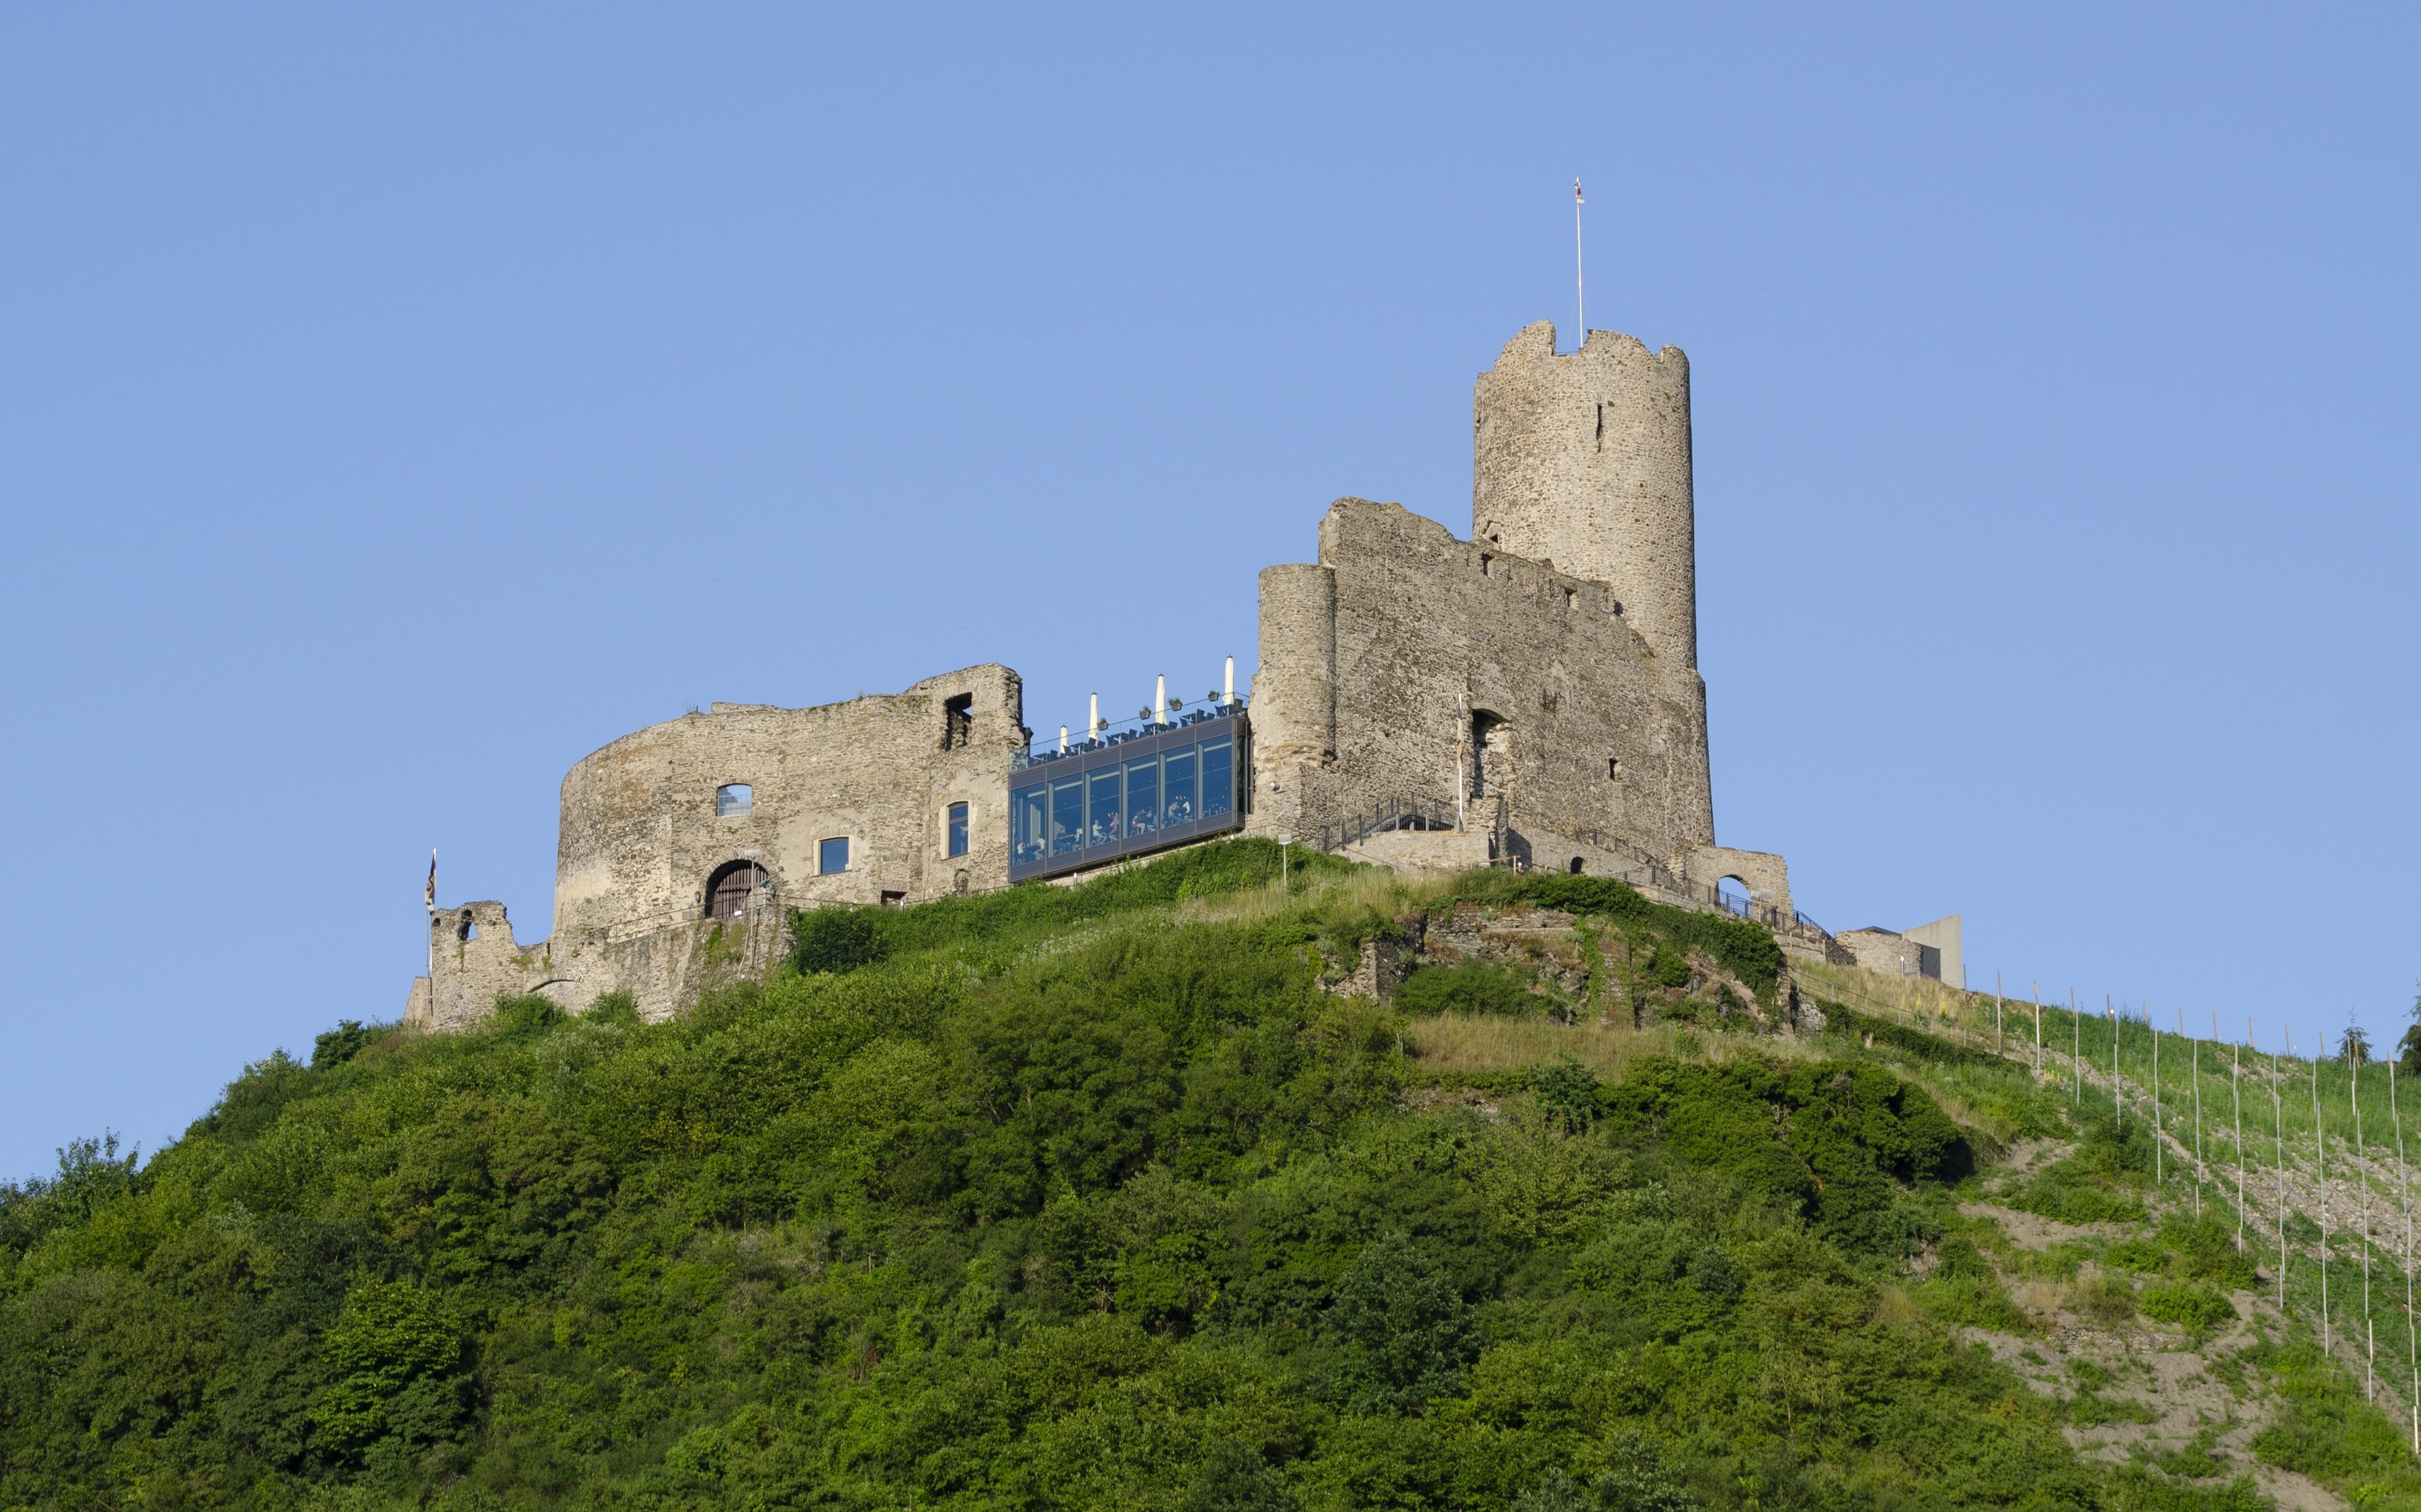 Bernkastel, Bernkastel-Kues, Rhineland-Palatinate, Germany